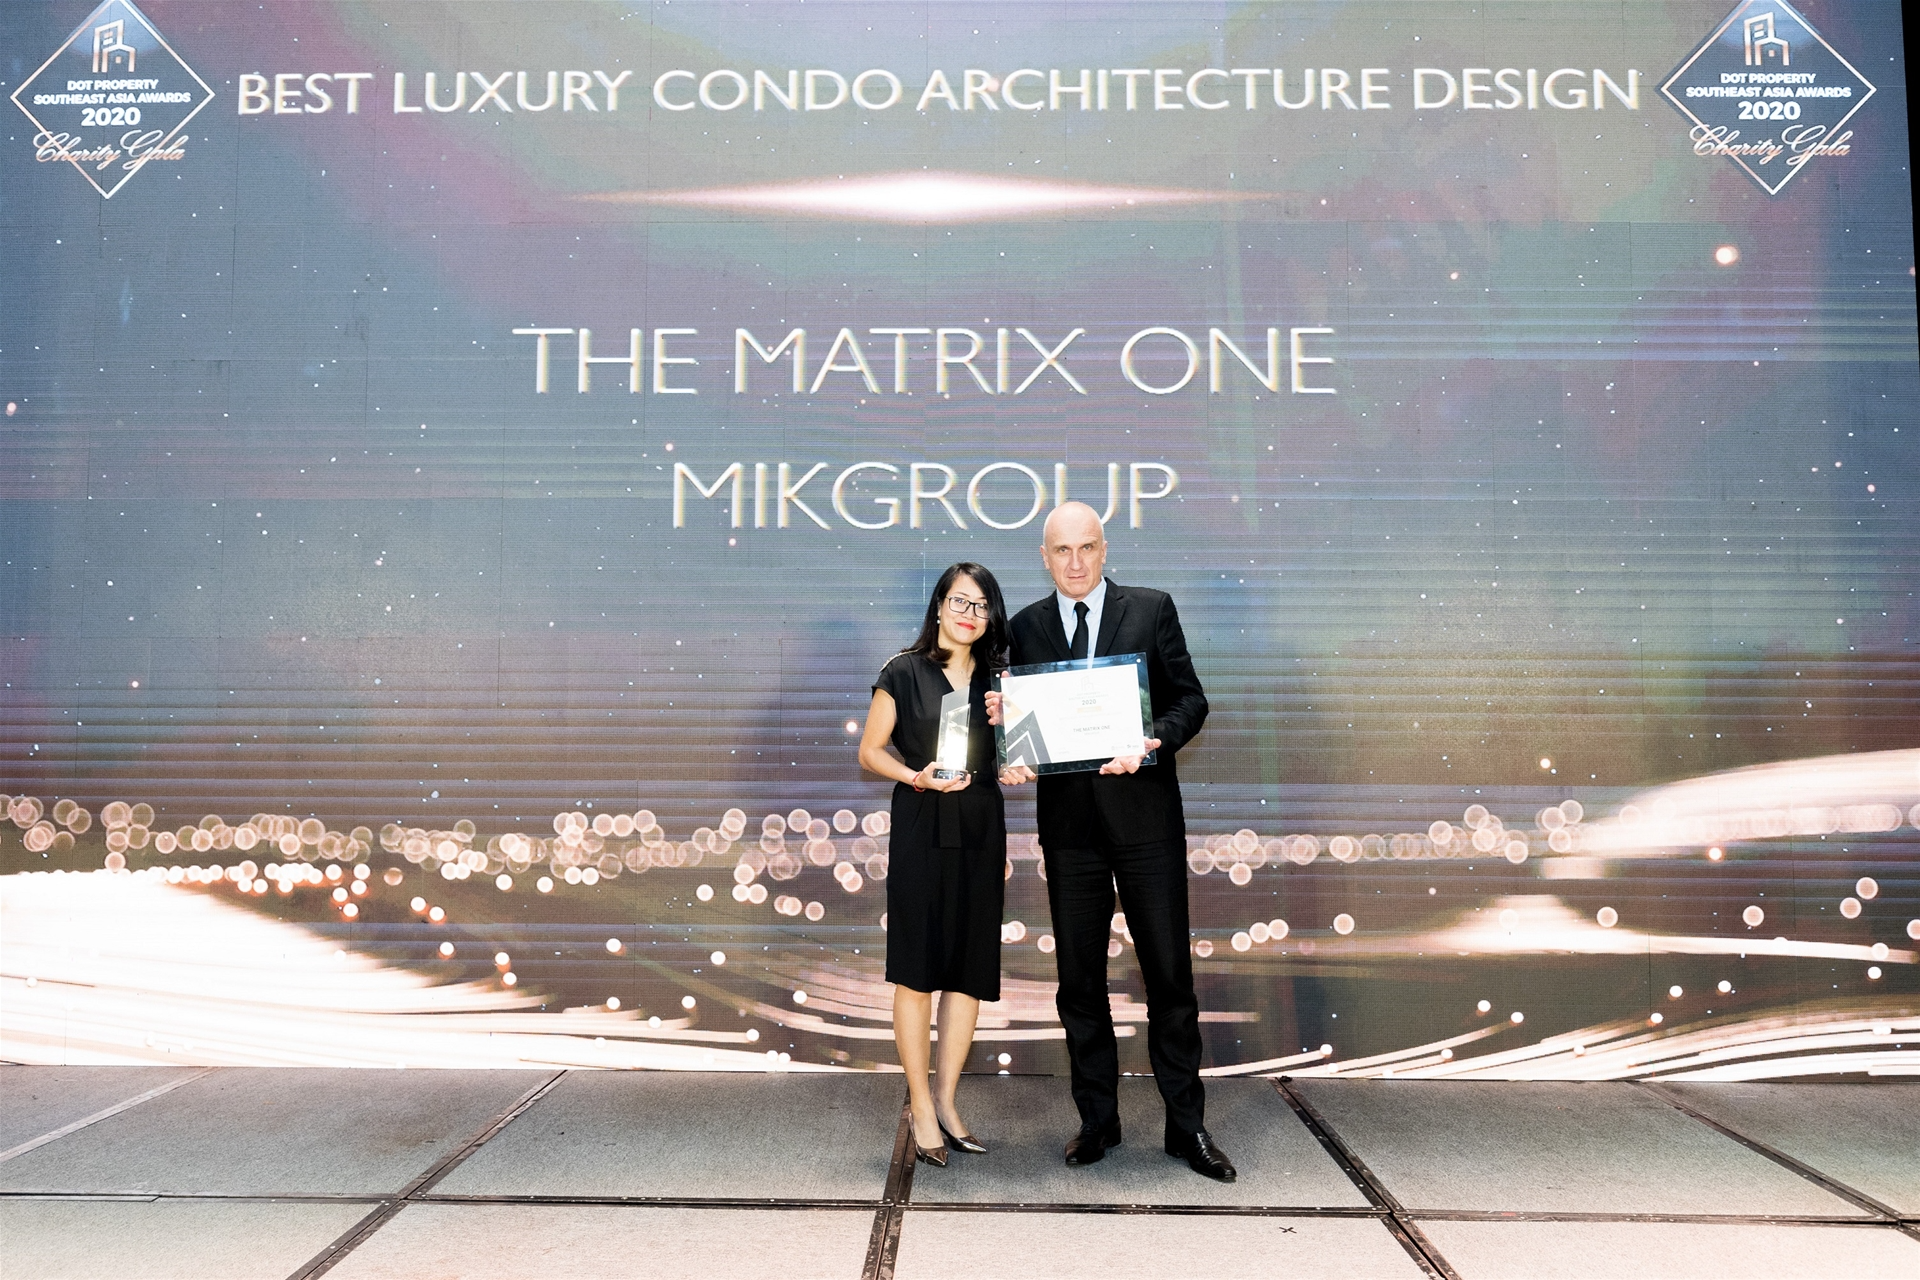 THE MATRIX ONE WINS SOUTHEAST ASIA'S BEST LUXURY CONDO ARCHITECTURAL DESIGN